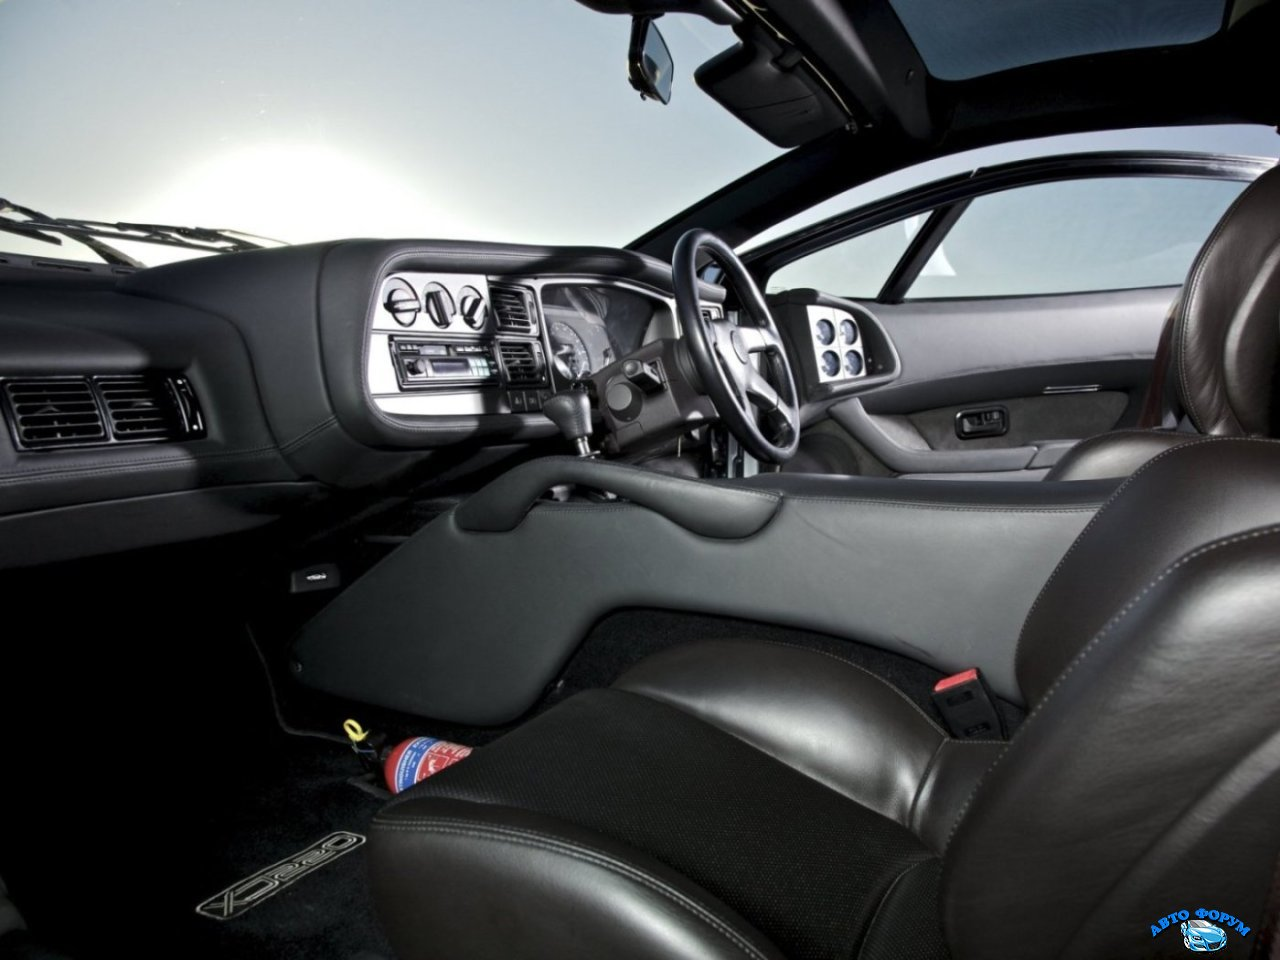 Jaguar_XJ220_Coupe_199200.jpg